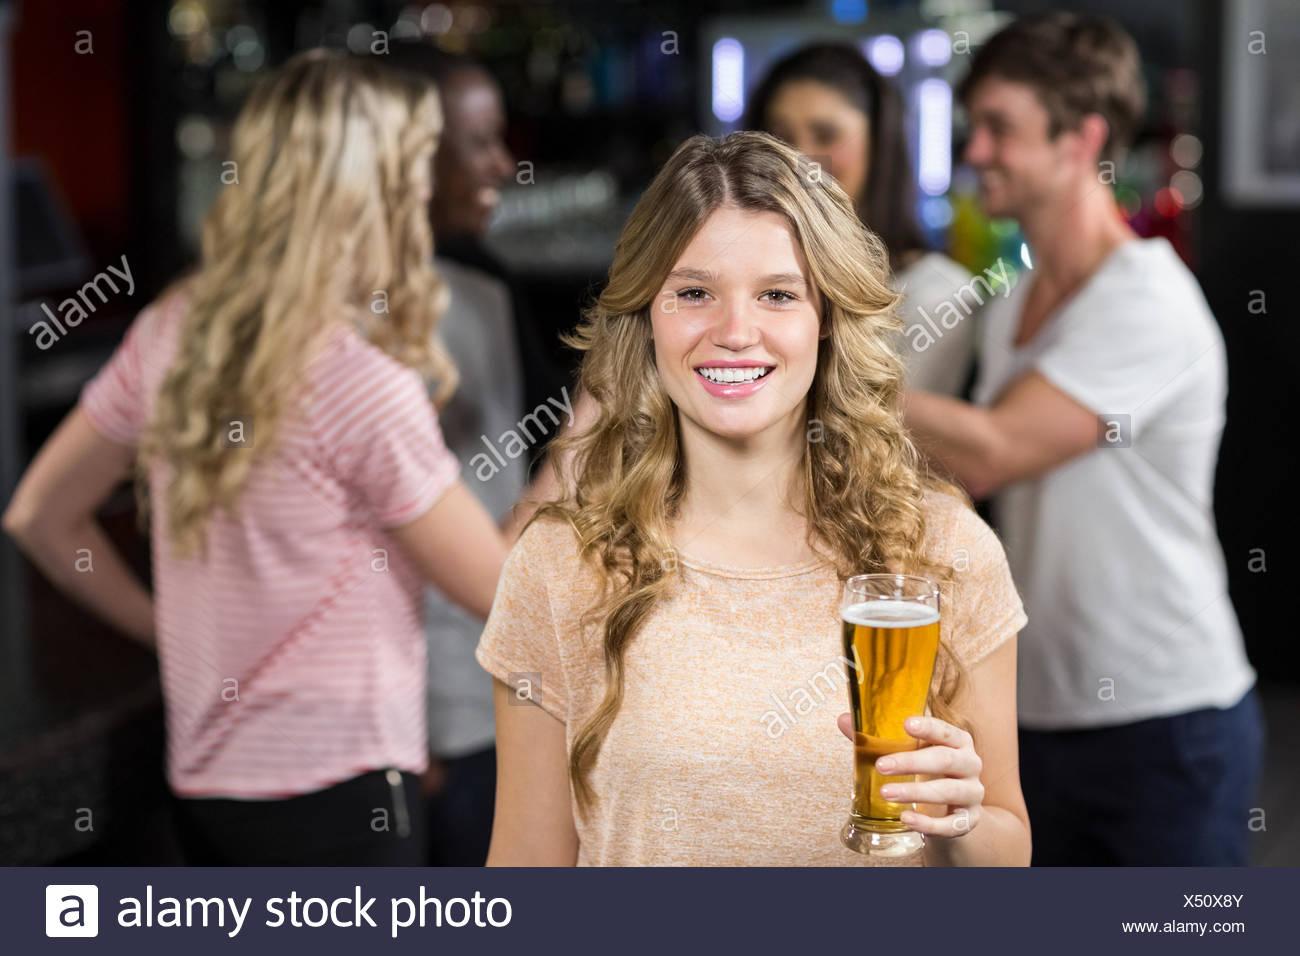 Smiling friends having beers - Stock Image